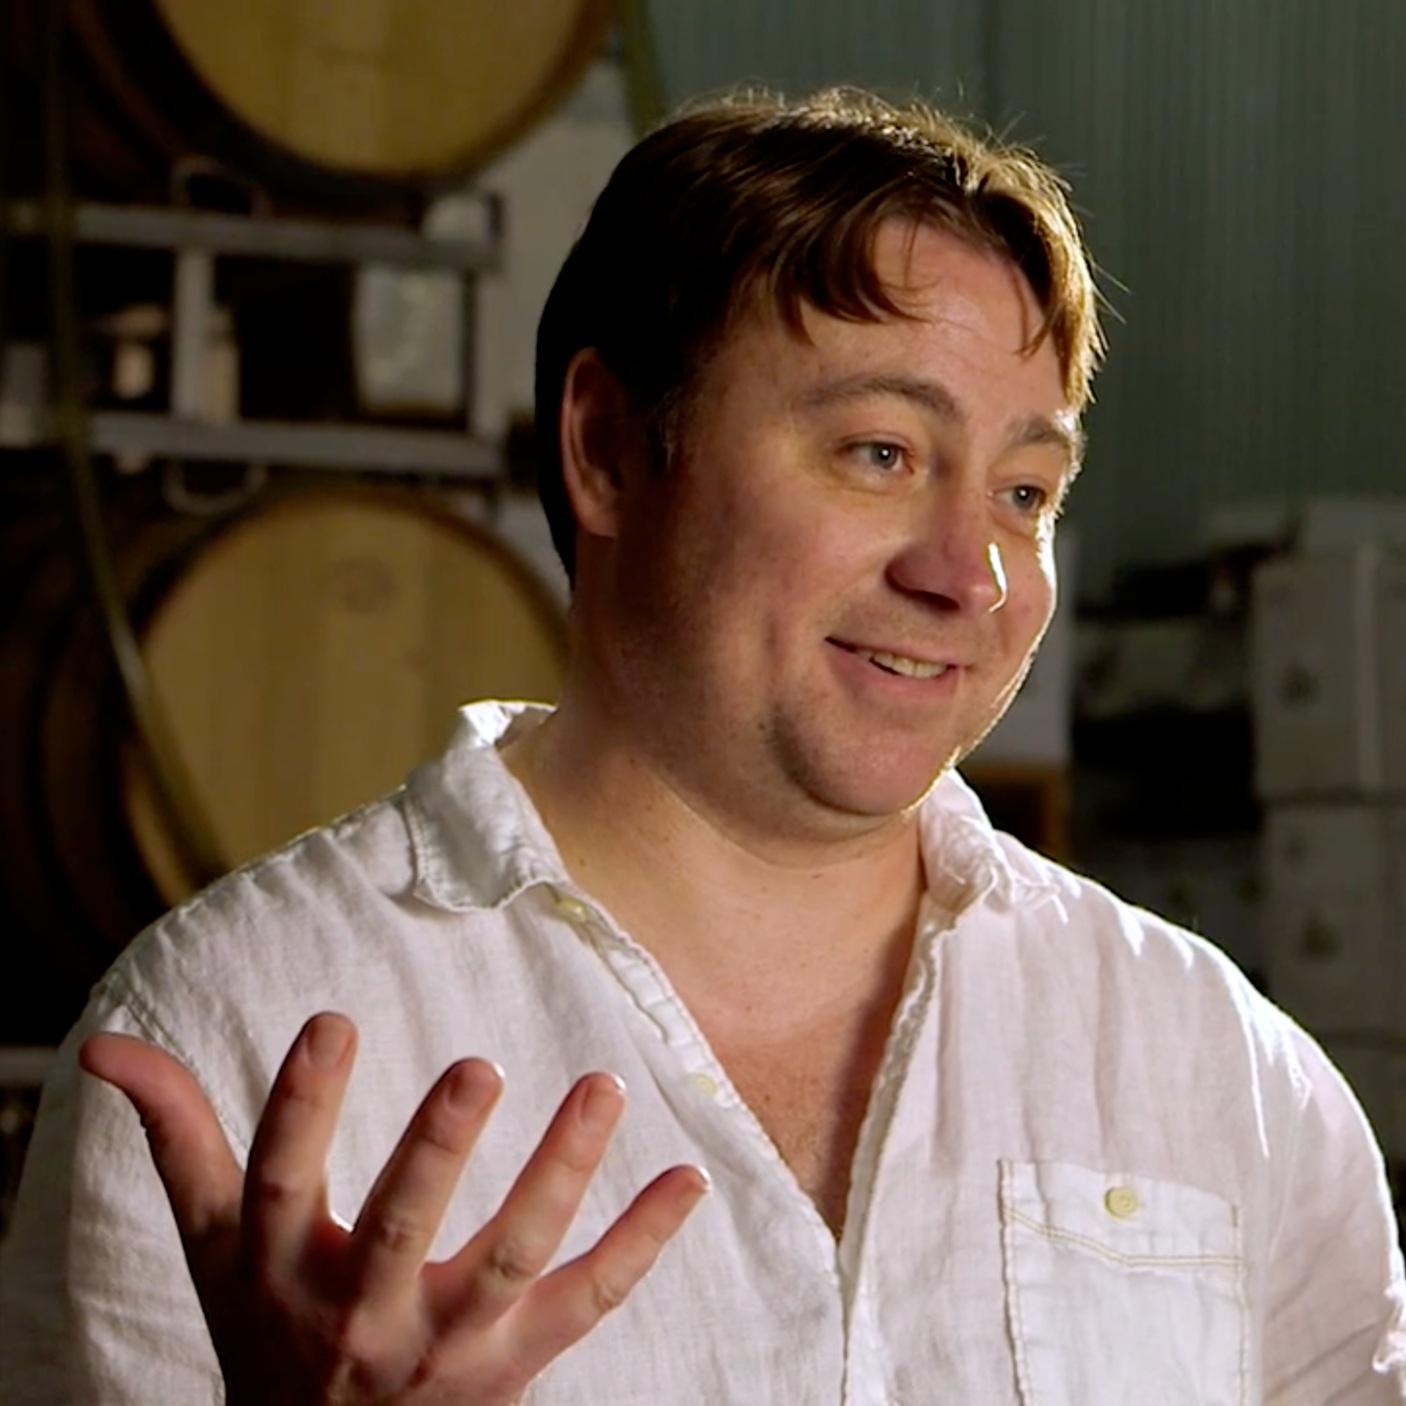 Jacob Toft - Jacob Toft Wines